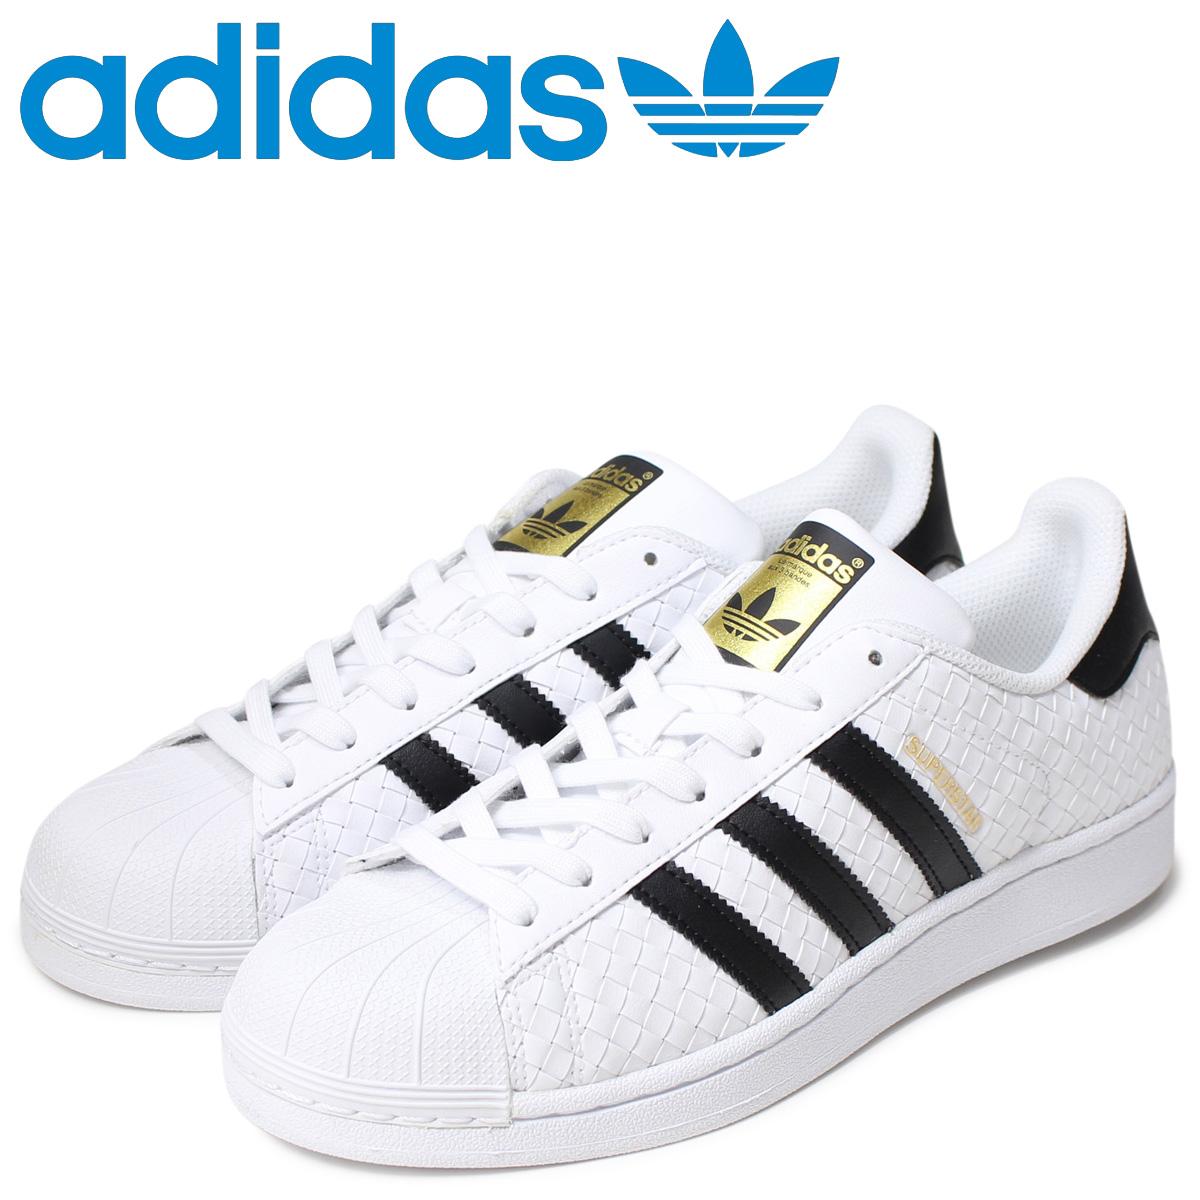 Adidas Sneakers Bb1172 Superstar Originals Men White PkZXiu